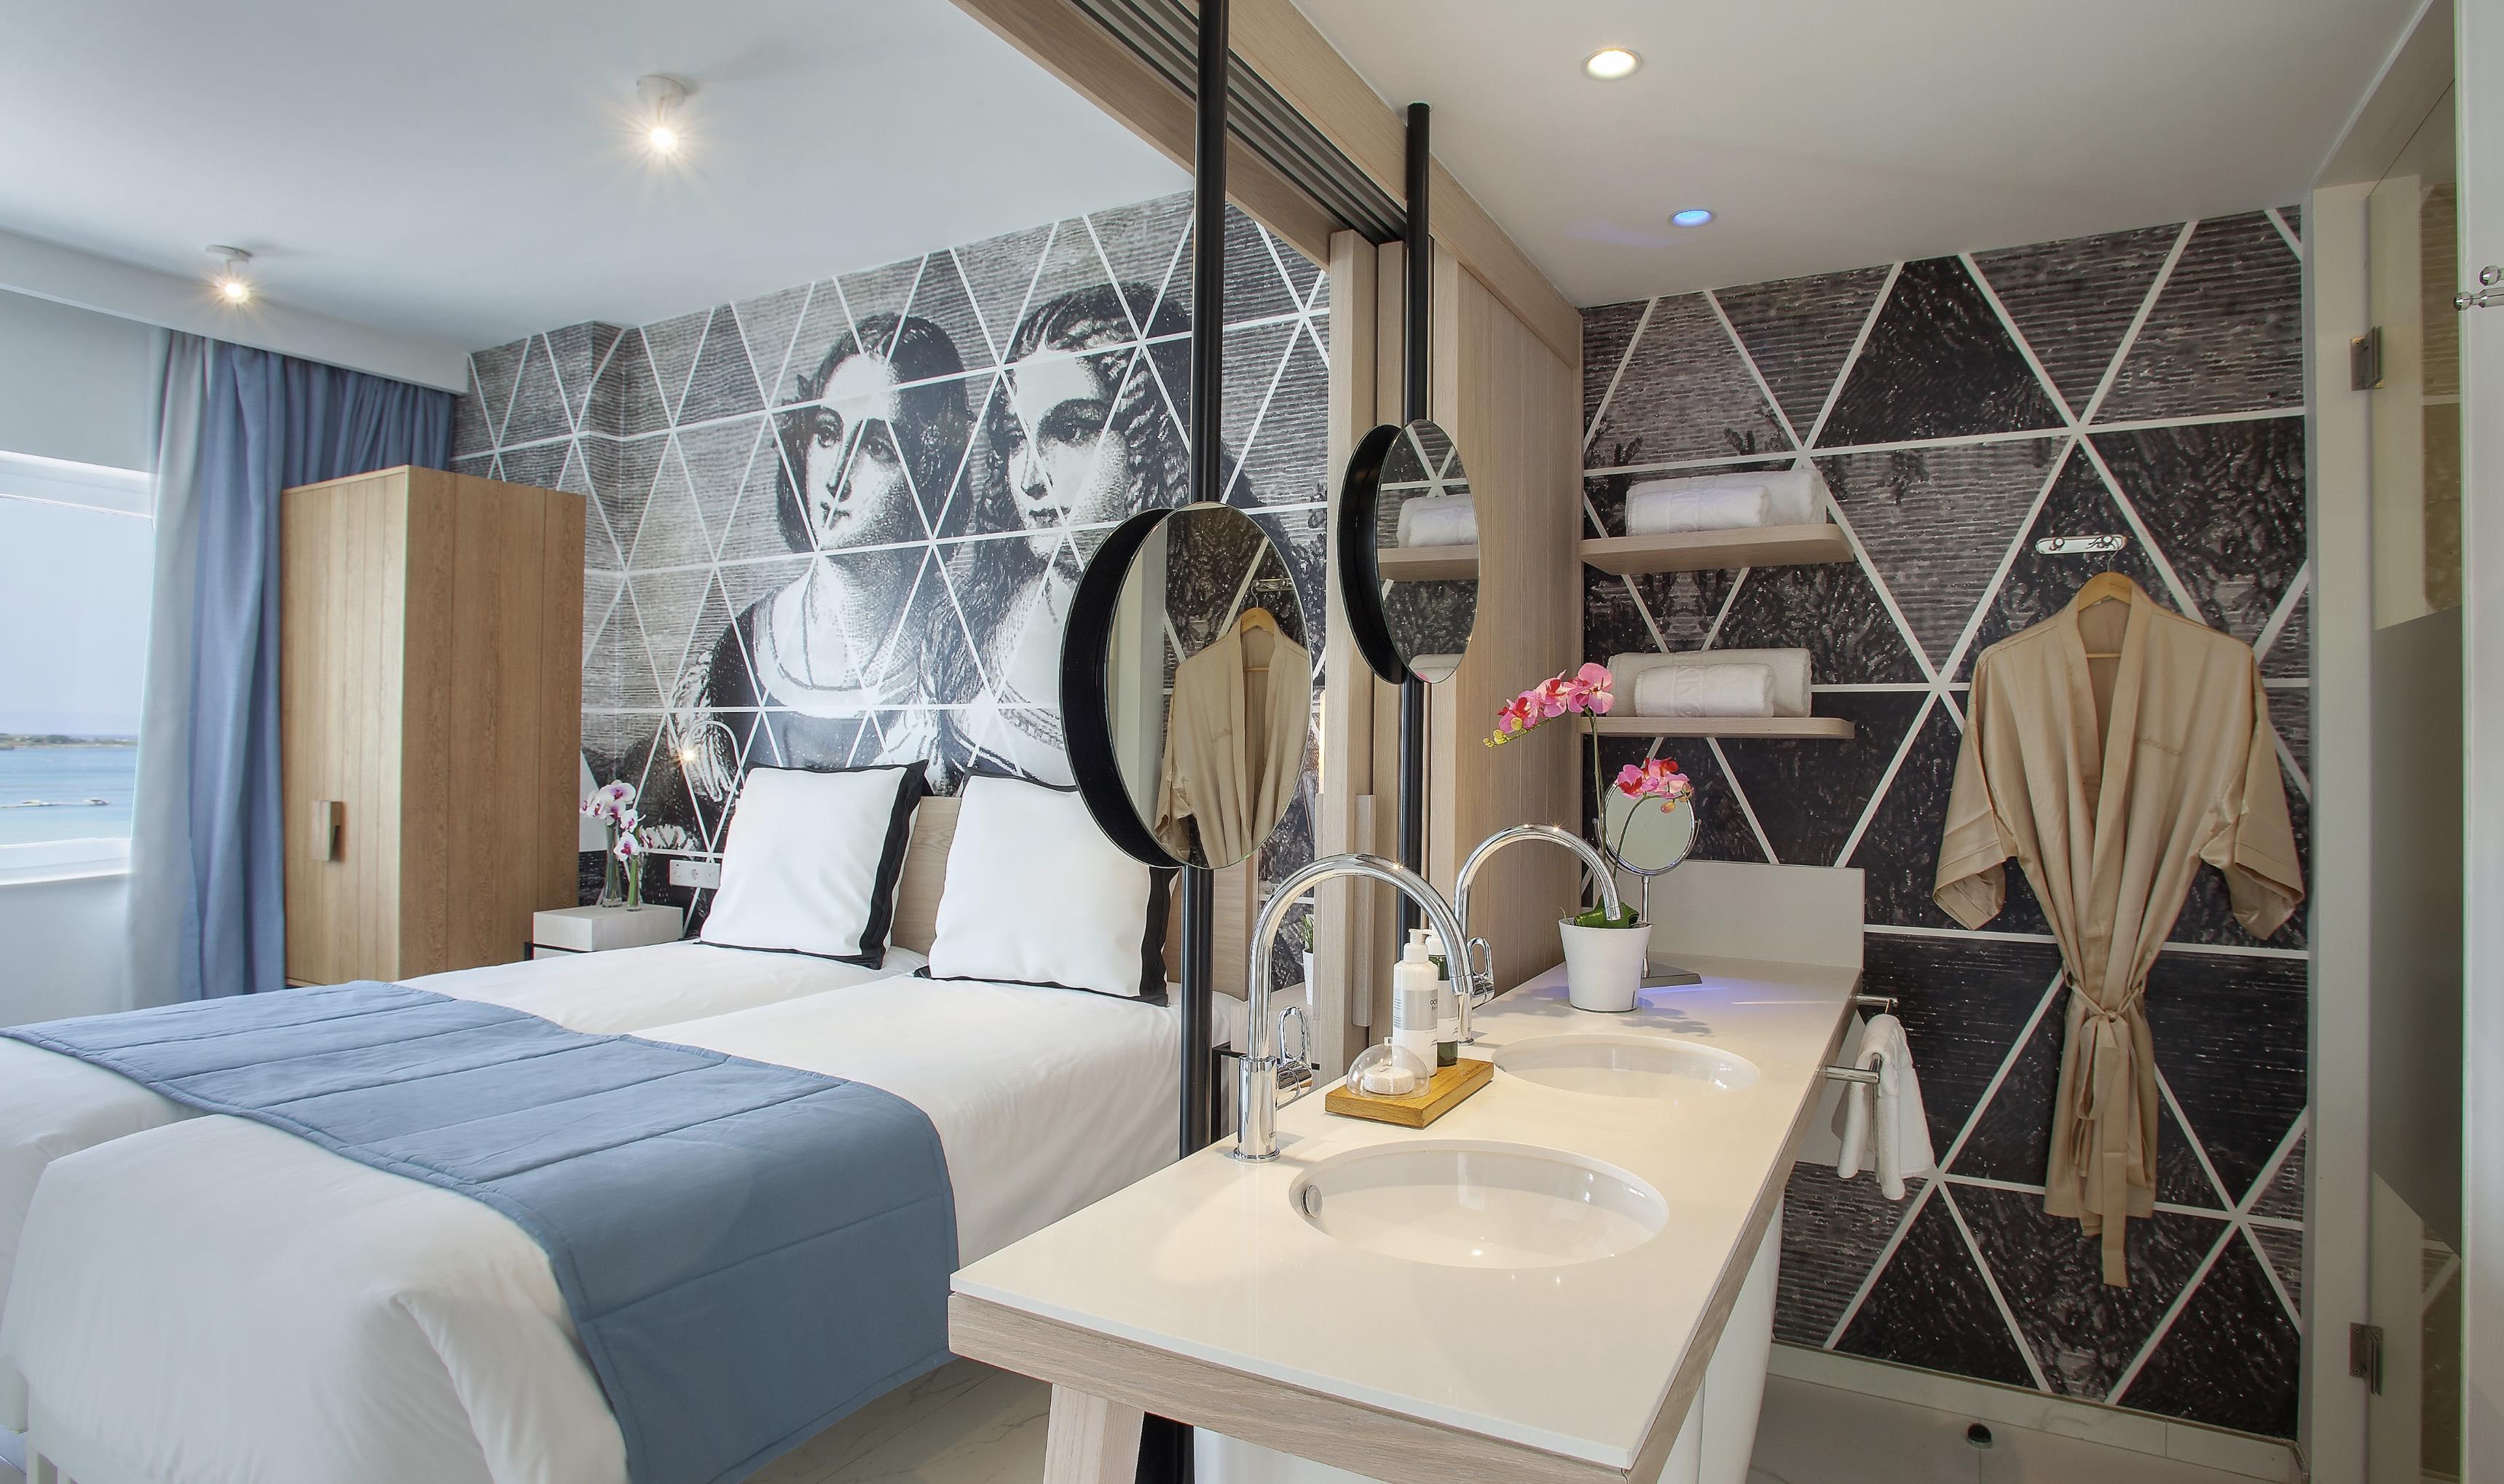 hotel mattress project - hotelier academy